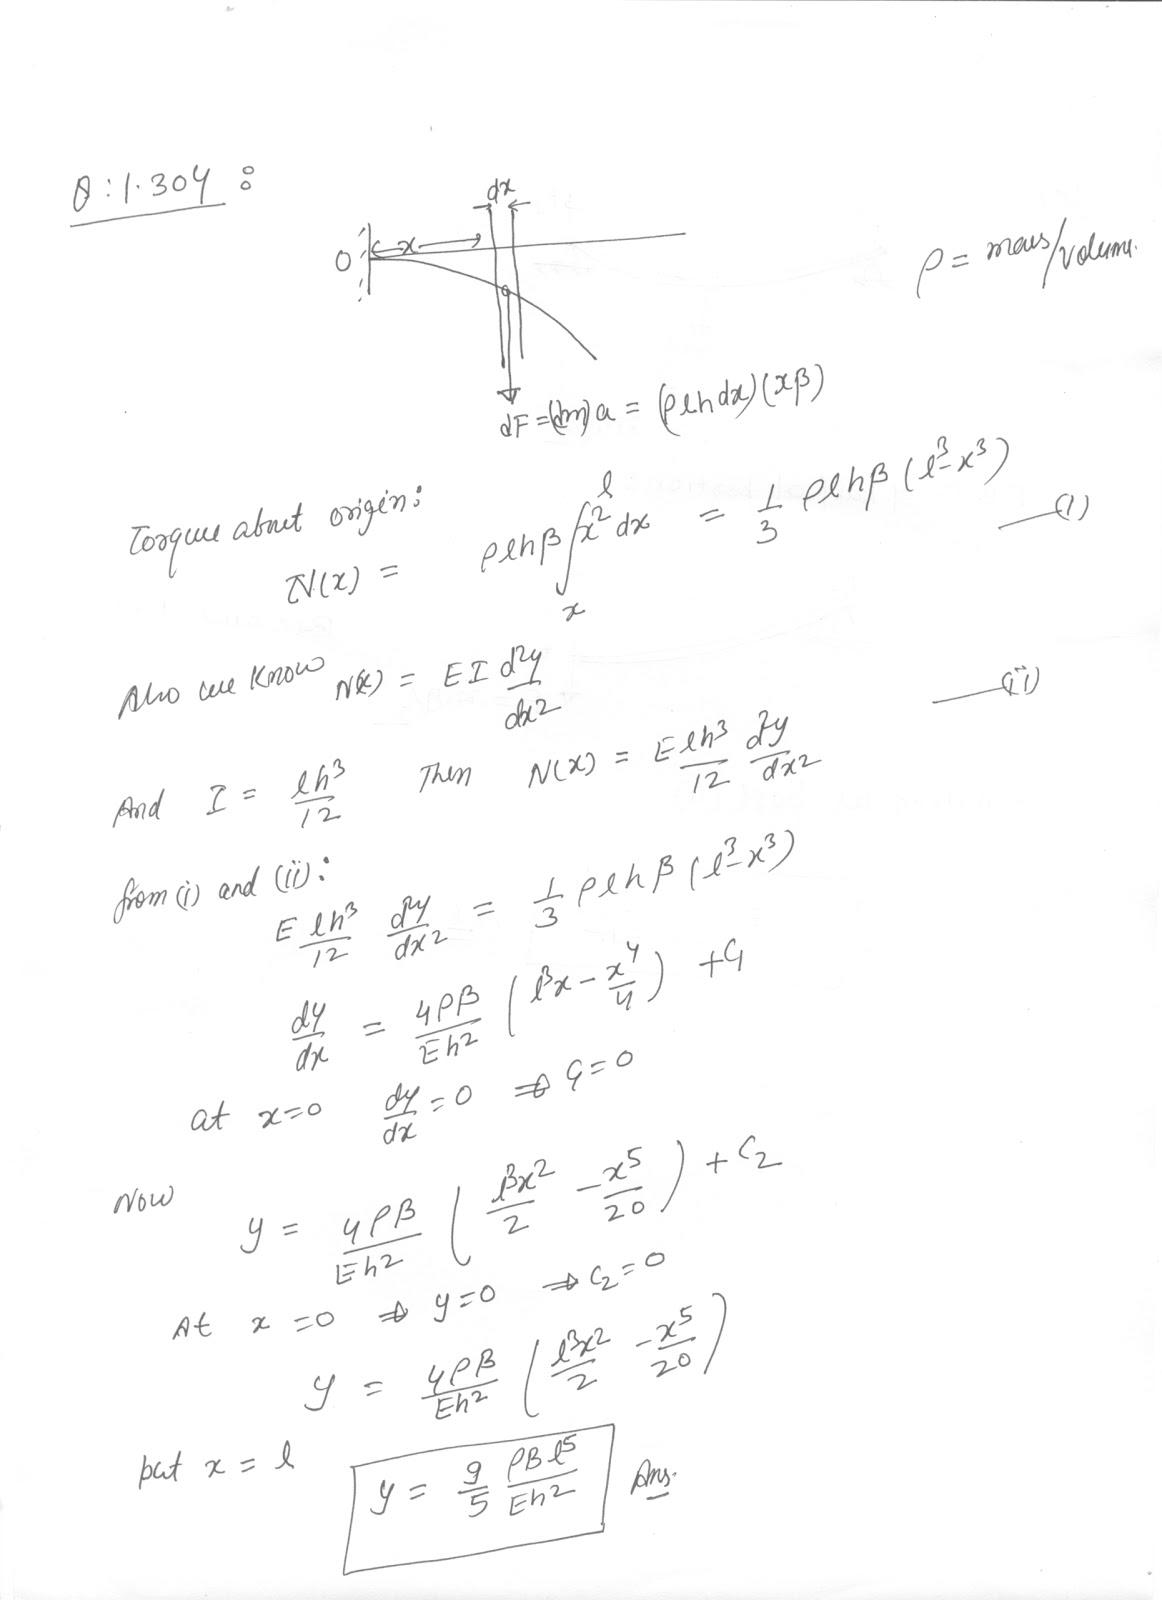 SOLUTIONS TO I E IRODOV BY RKH: PROBLEM:1.304